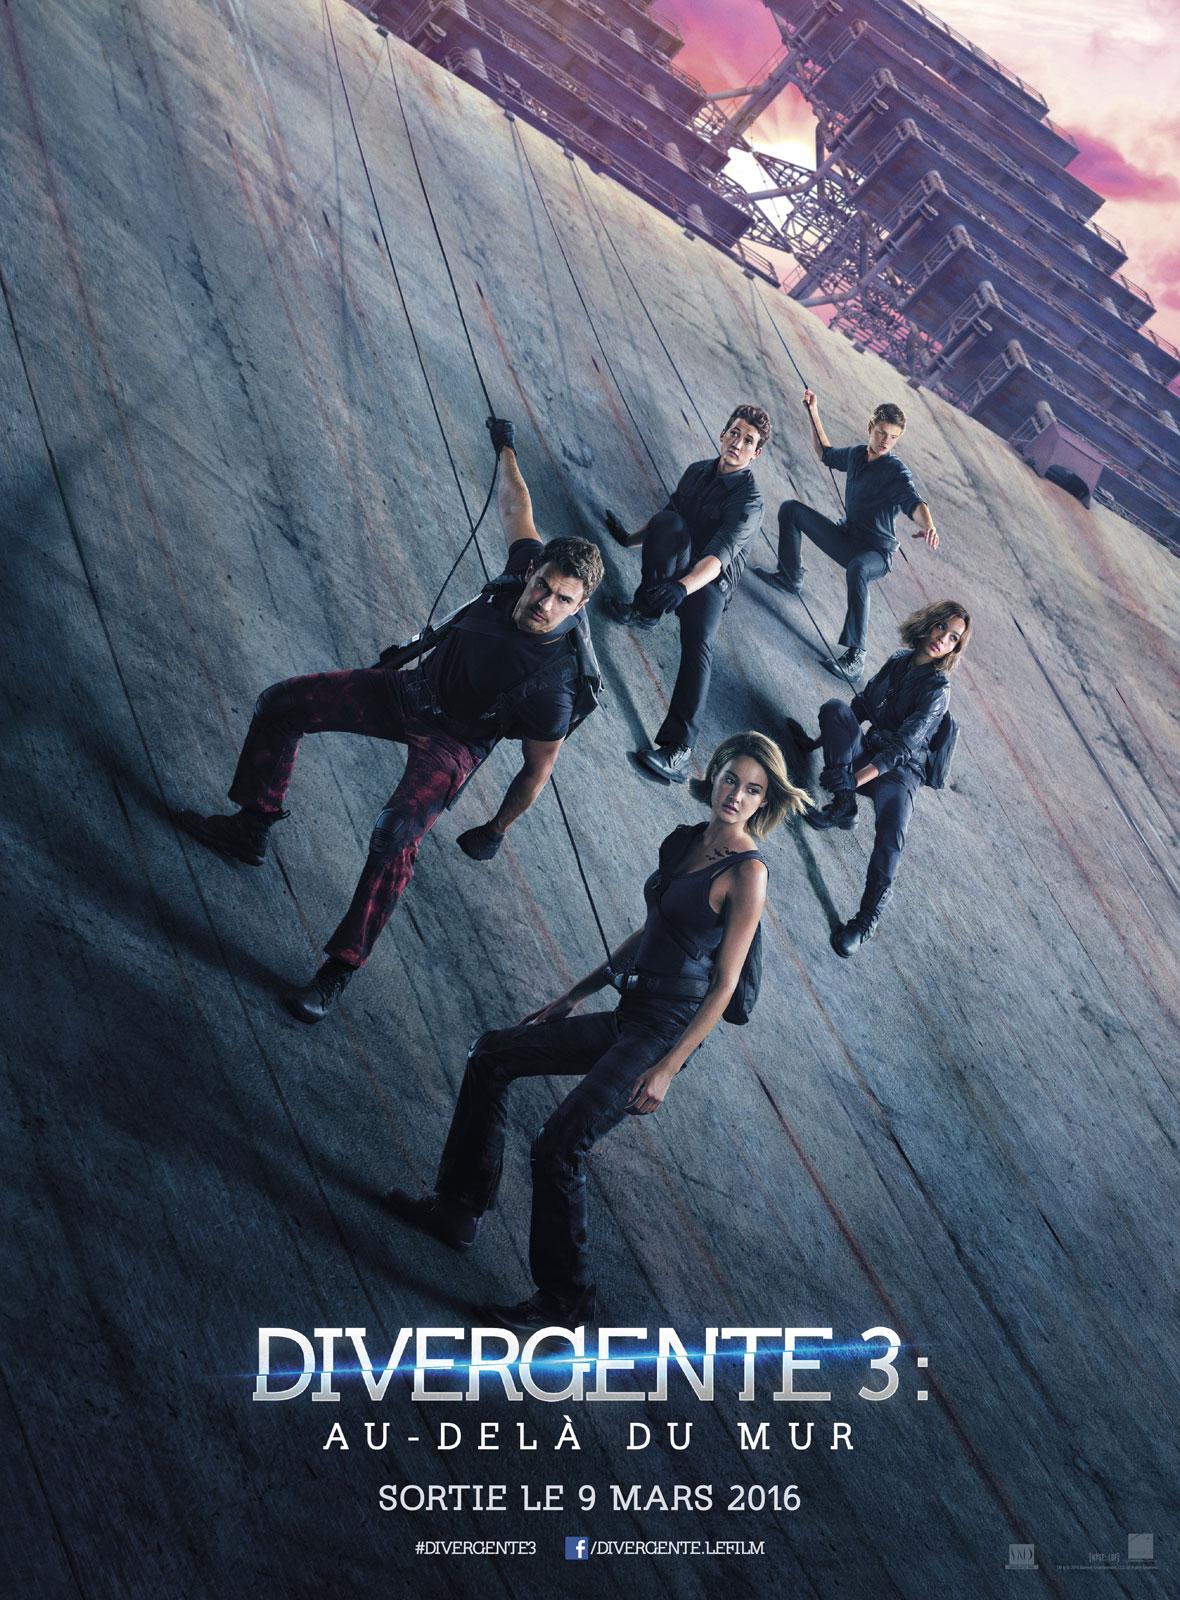 Divergente 3 : au-delà du mur : Affiche